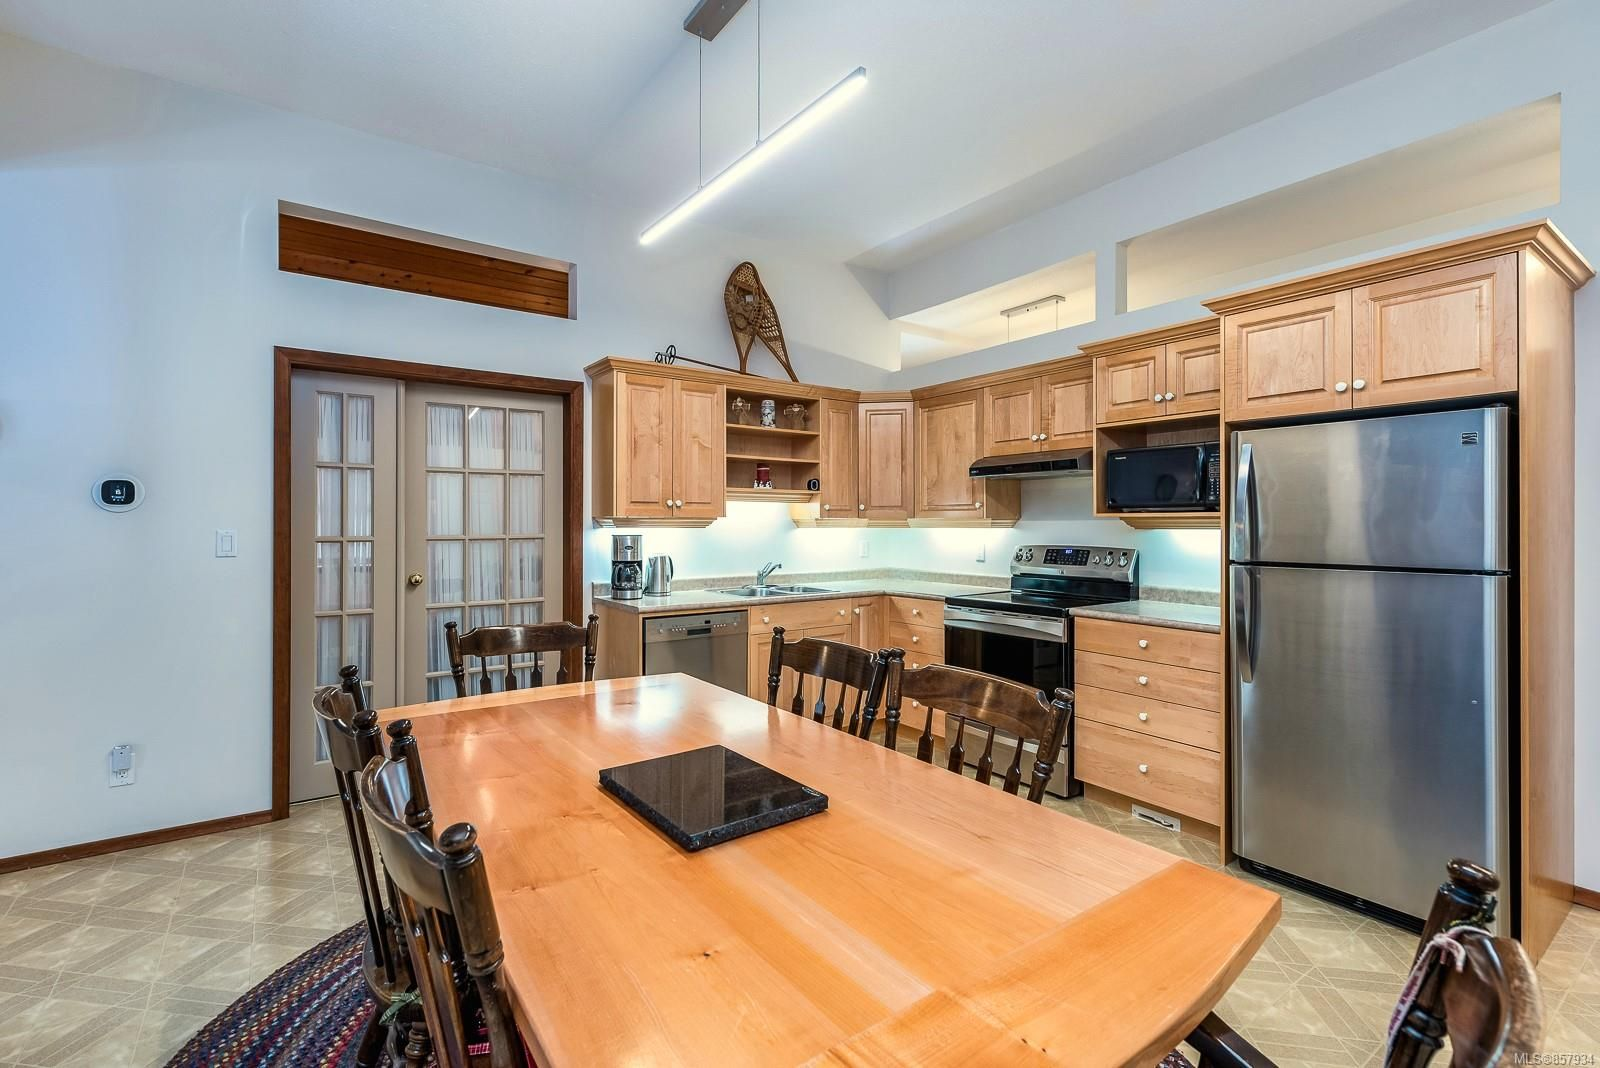 Photo 5: Photos: 998 STRATA Way in : CV Mt Washington House for sale (Comox Valley)  : MLS®# 857934